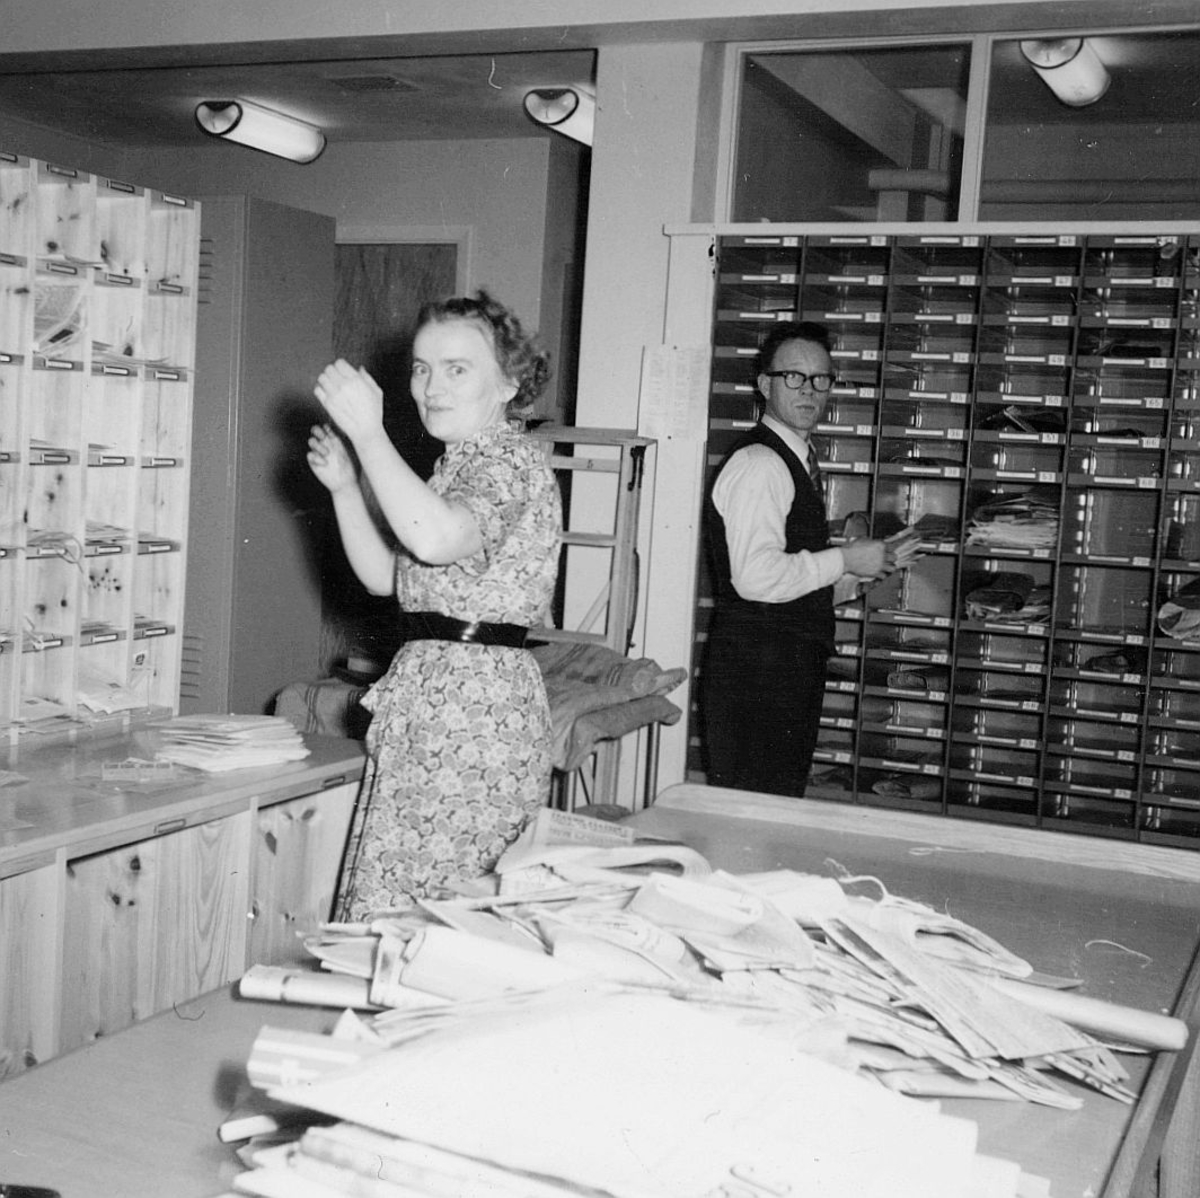 person, lokalbud Refsnes, postbud Eikeland, interiør, brevsortering